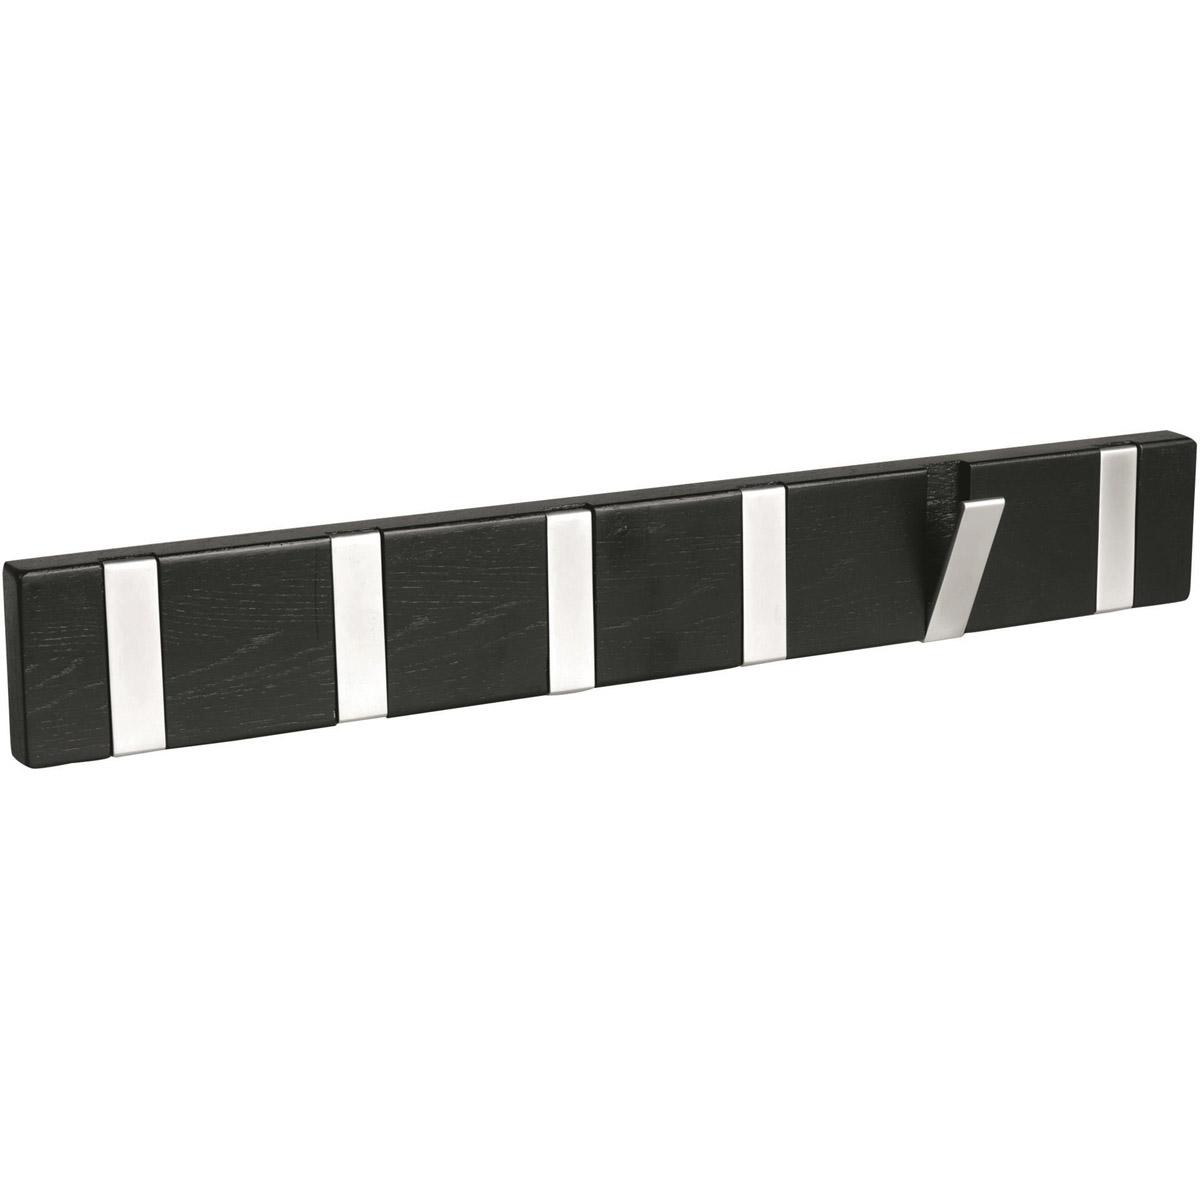 Confetti kroklist 6 flipkrokar B50 svart